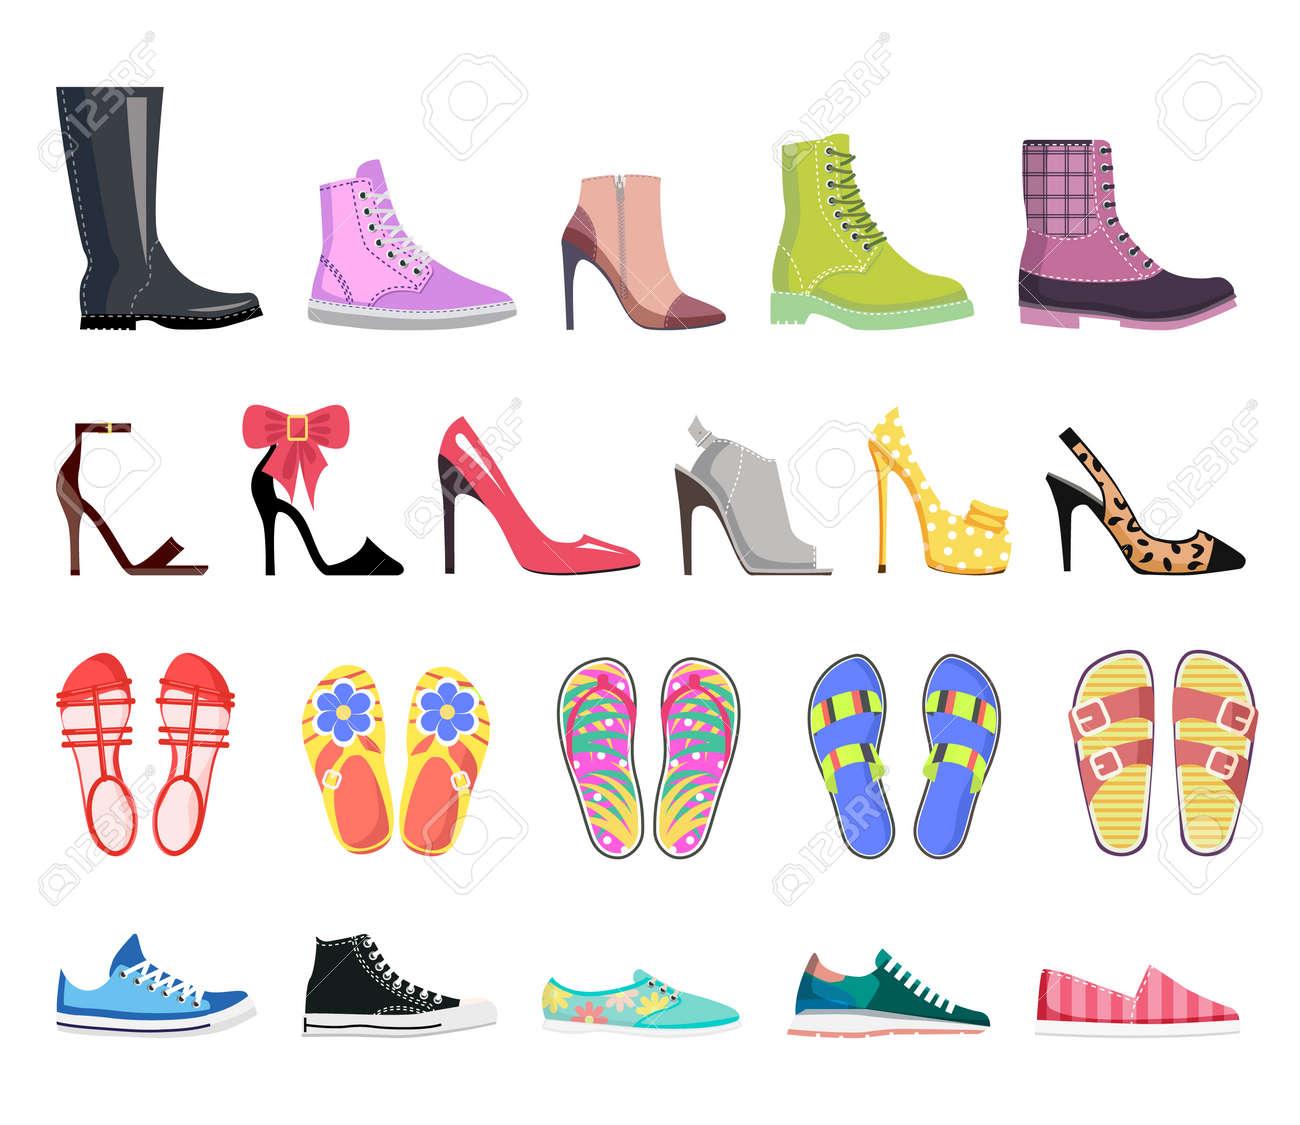 Mujer Colección Zapatos Calzado Moderna De Ilustraciones Tipos wwOIxqHZr7